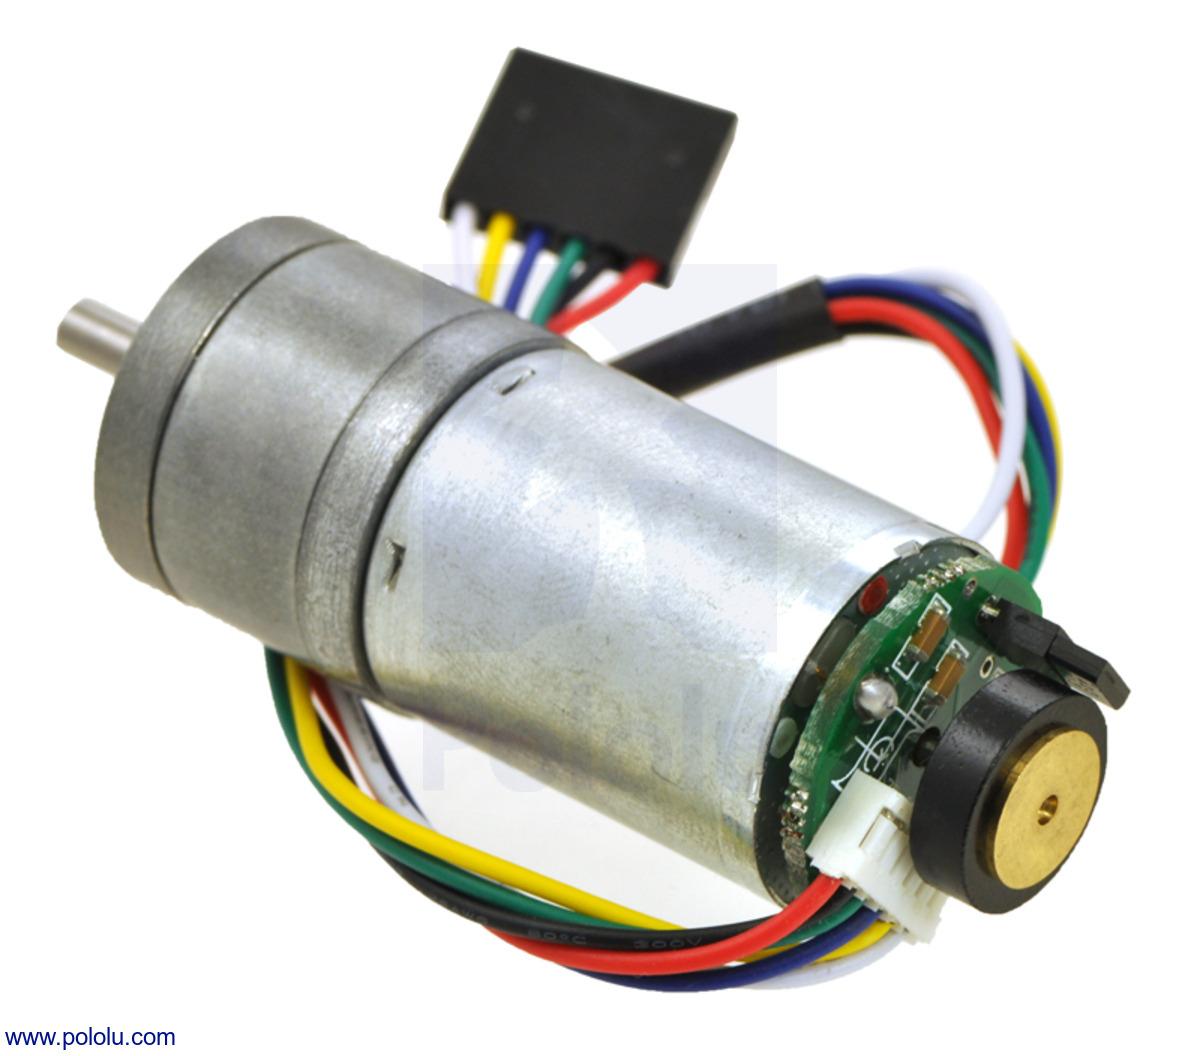 Pololu 227:1 Metal Gearmotor 25Dx56L mm MP 12V with 48 CPR Encoder